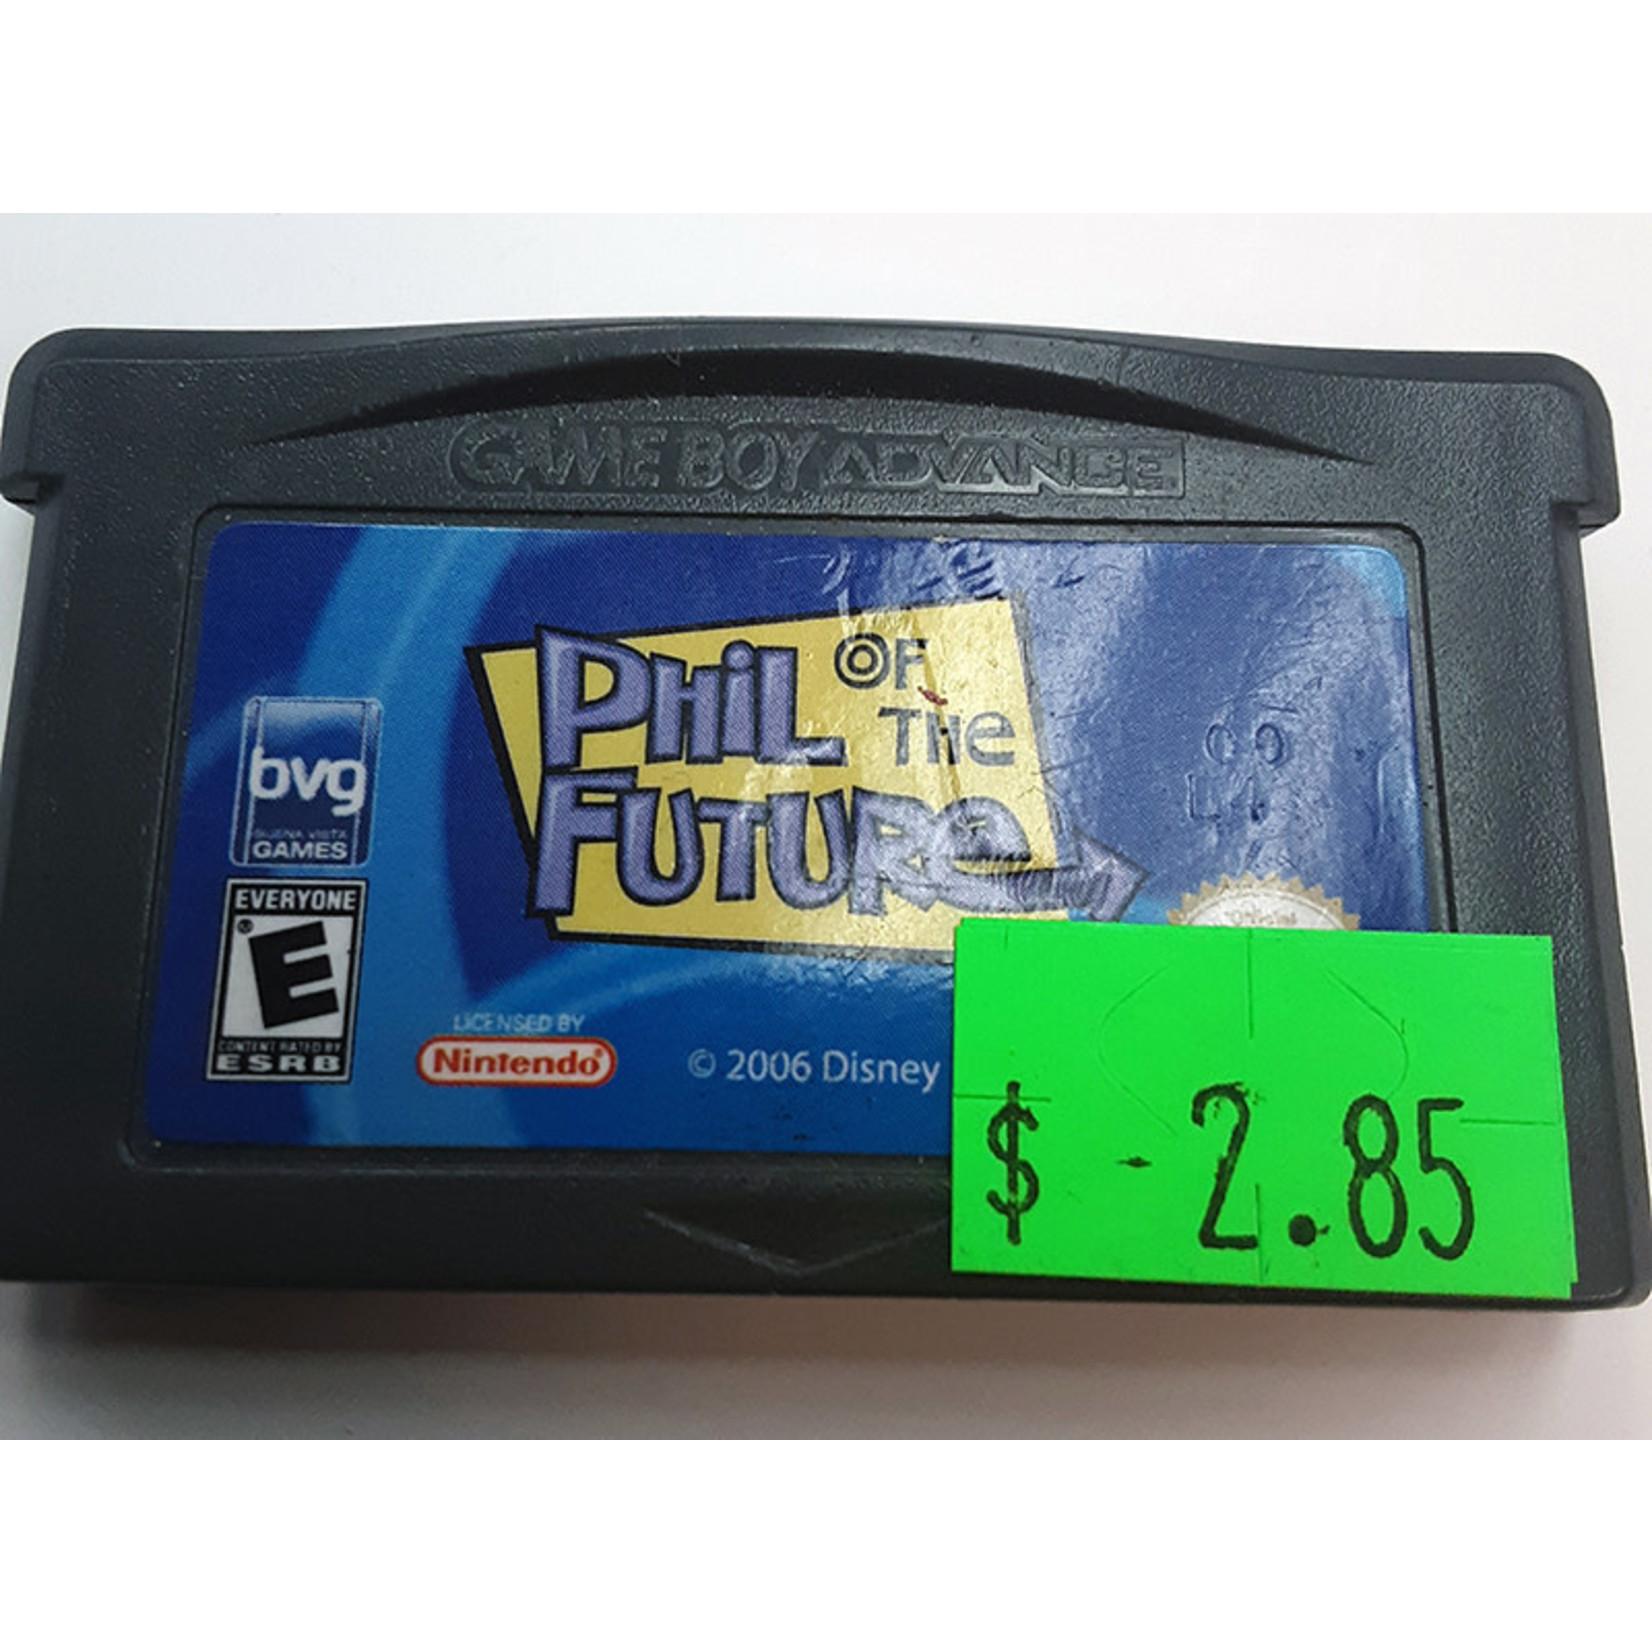 GBAu-Phil of the Future (cartridge)